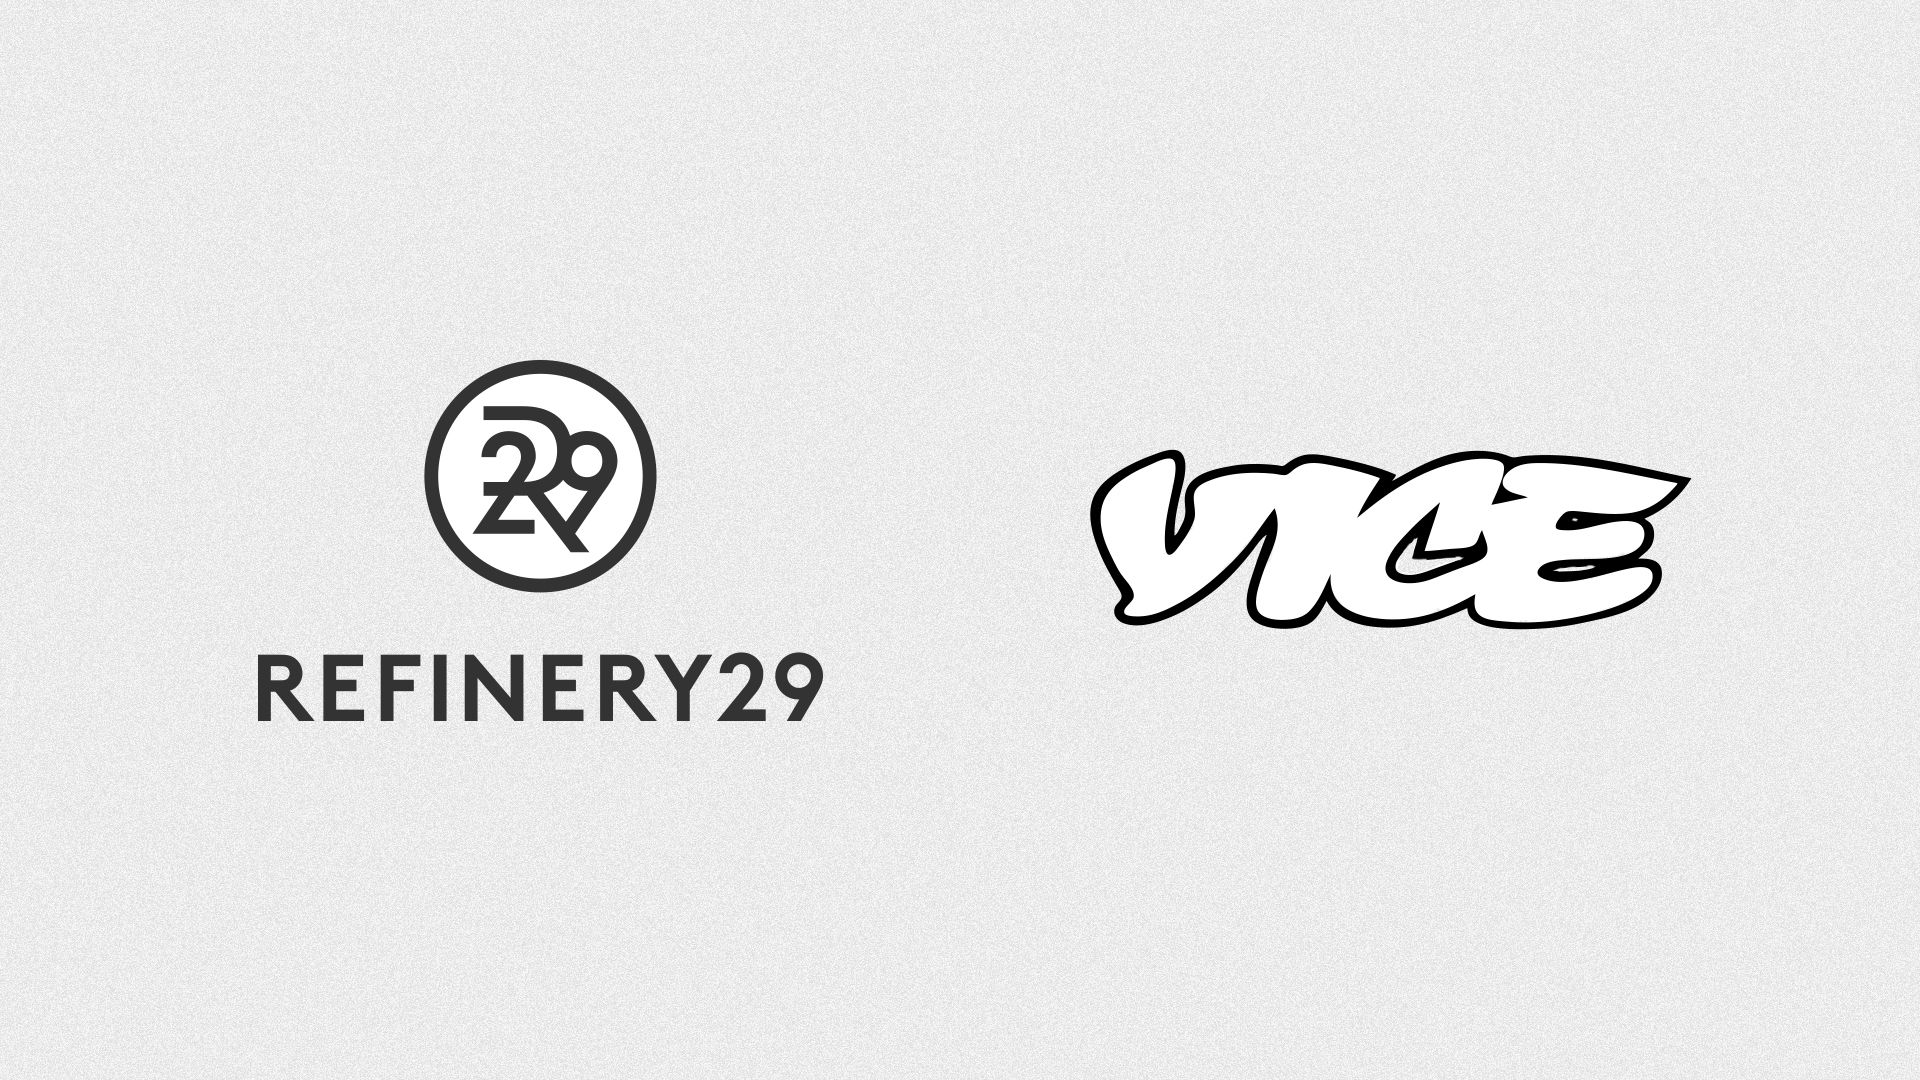 Vice Media acquires Refinery29